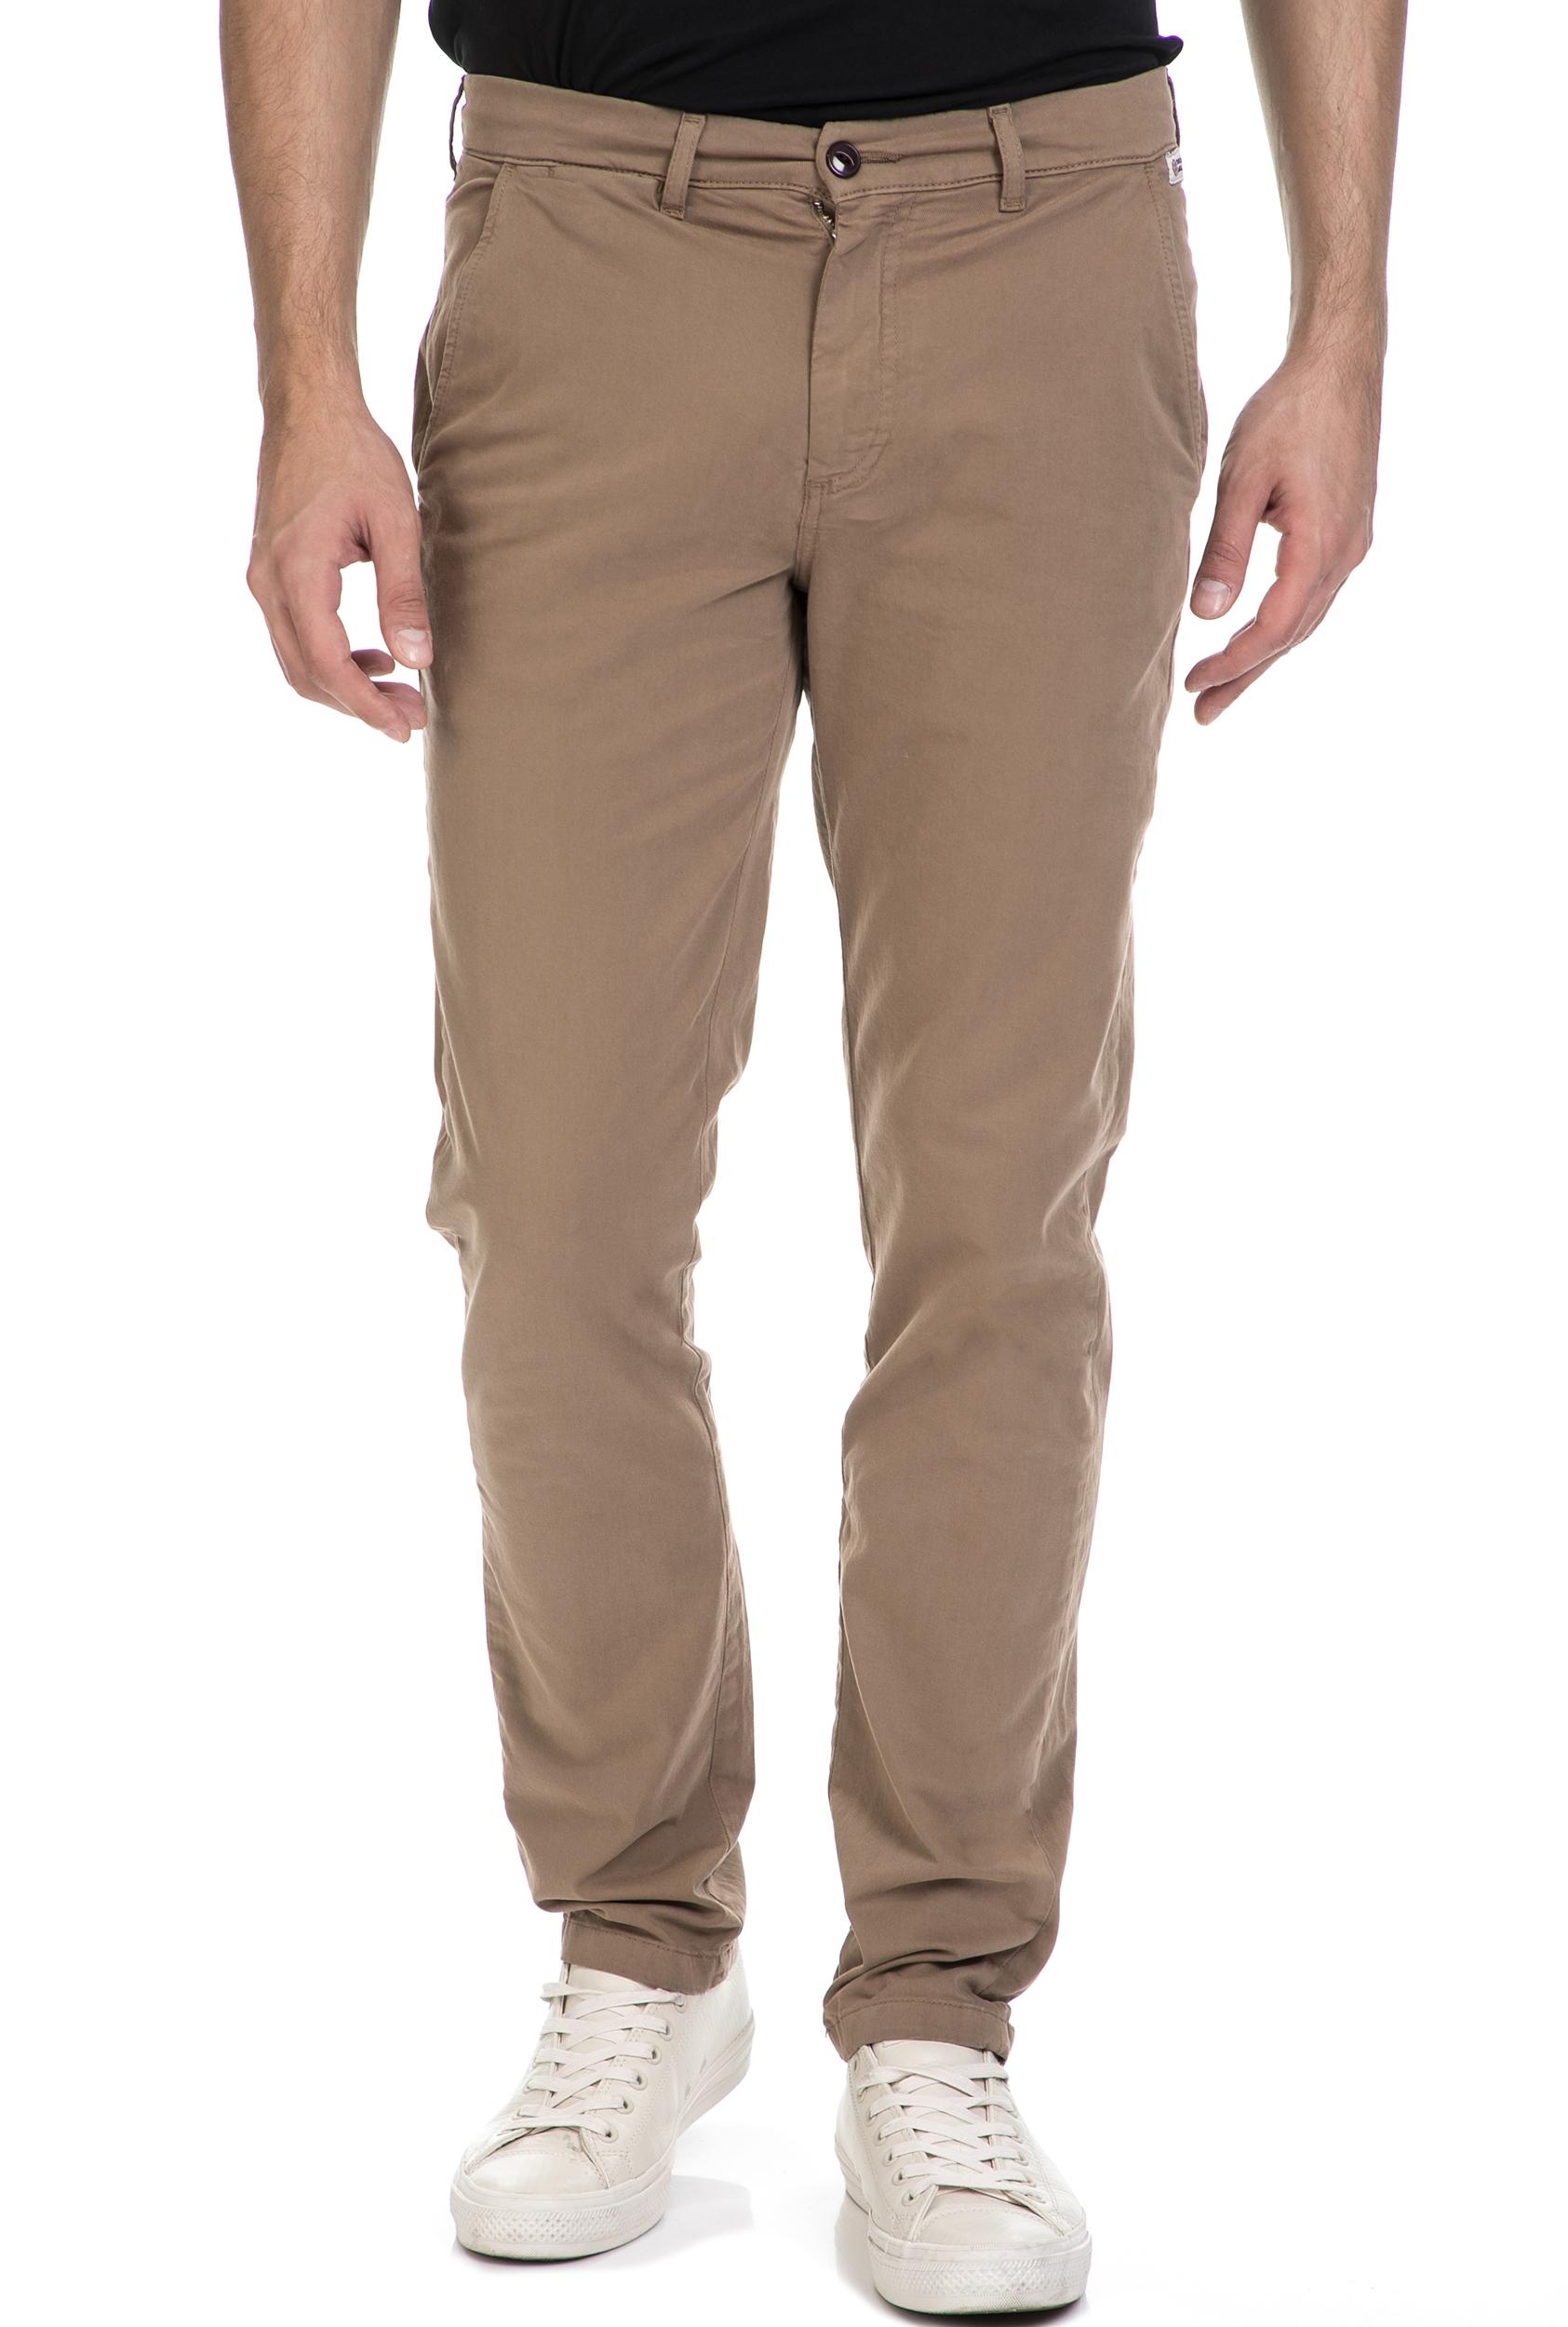 FRANKLIN & MARSHALL - Ανδρικό παντελόνι FRANKLIN & MARSHALL μπεζ ανδρικά ρούχα παντελόνια chinos